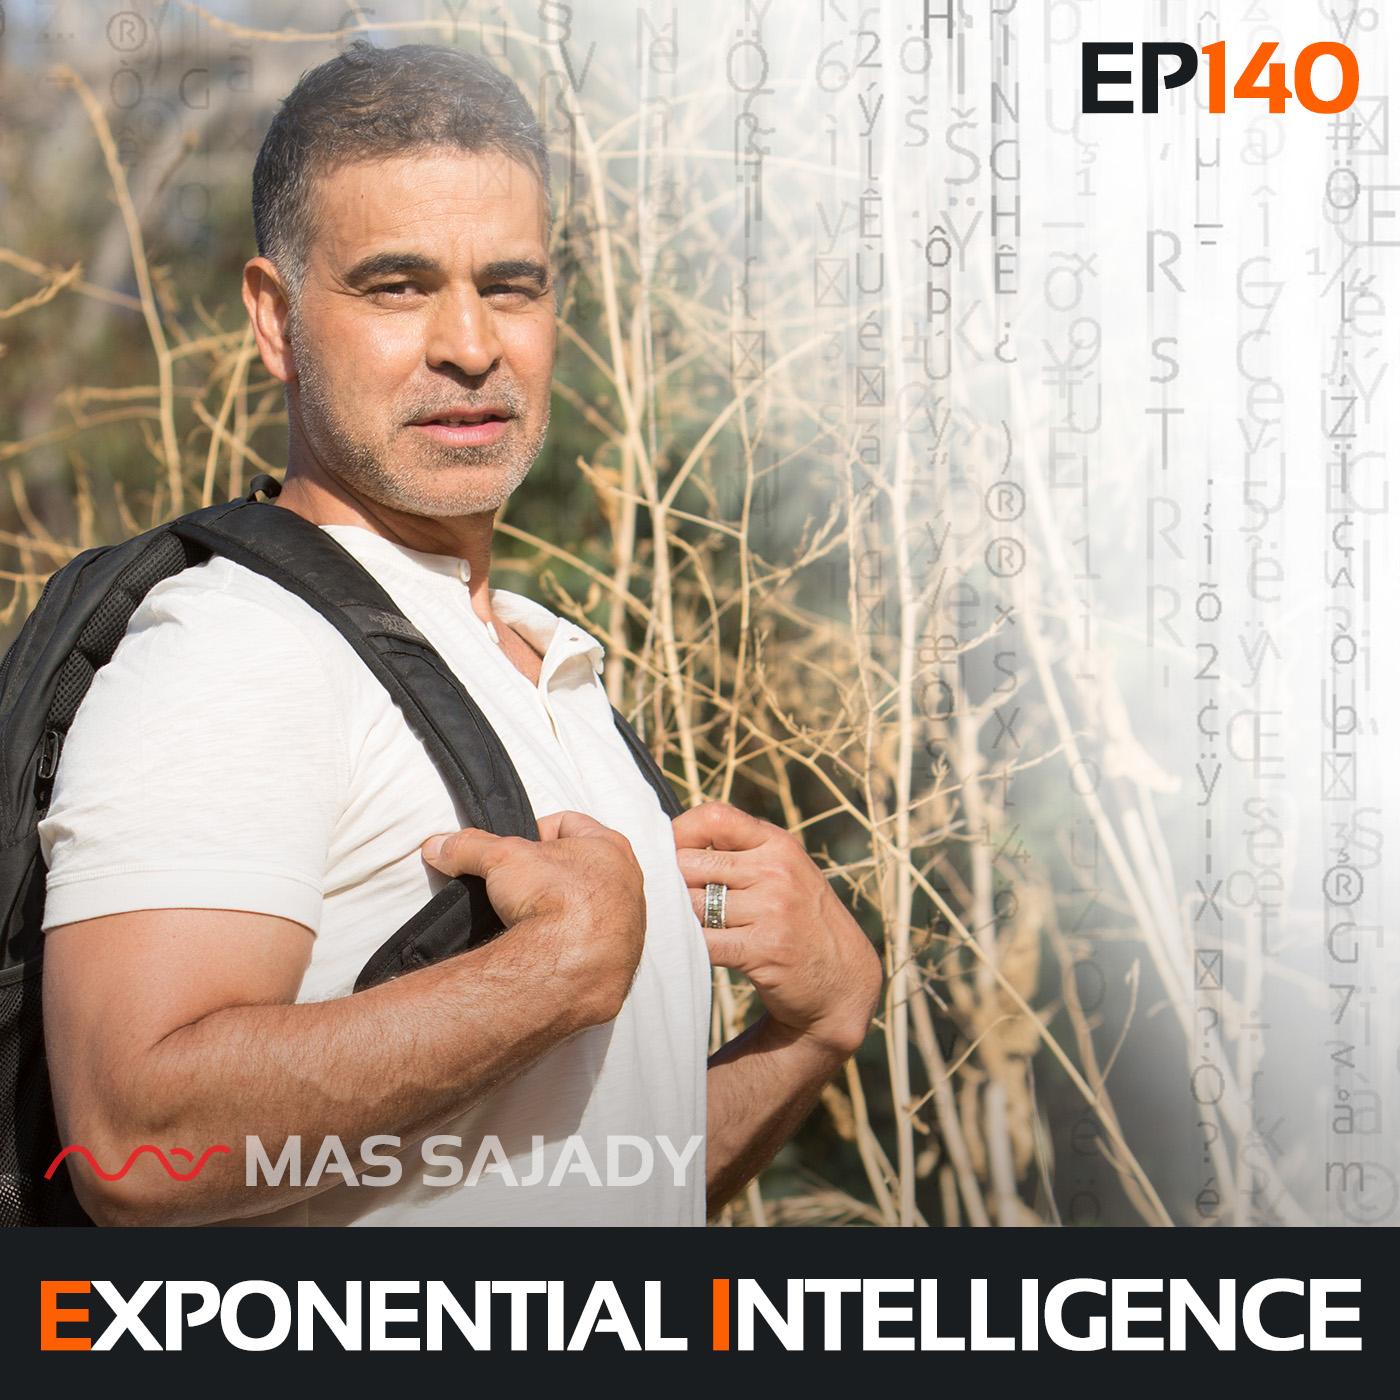 140 episode art - exponential intelligence.jpg